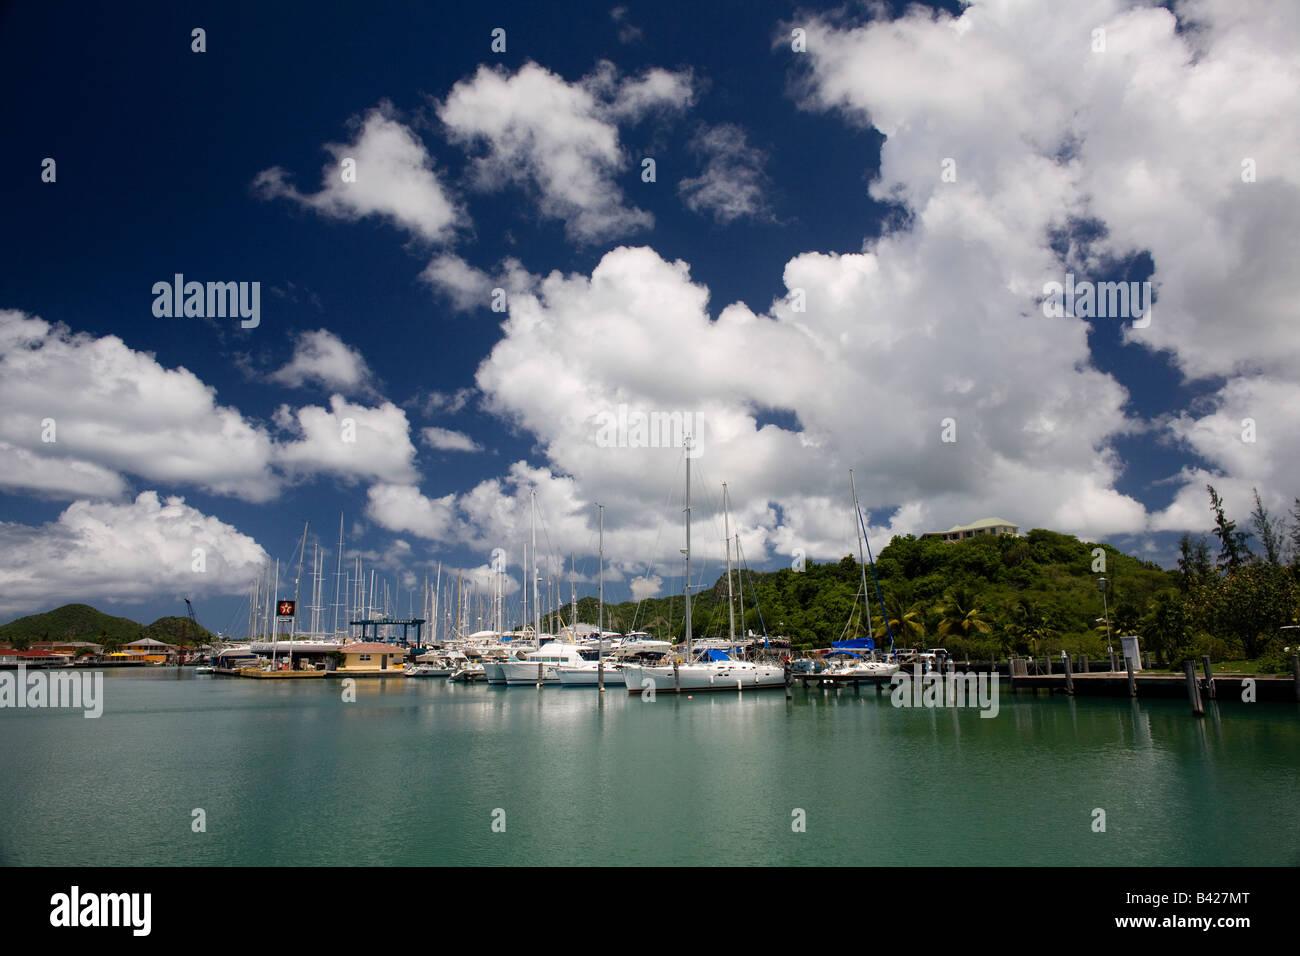 Yates fondeados en Jolly Harbour Antigua Imagen De Stock